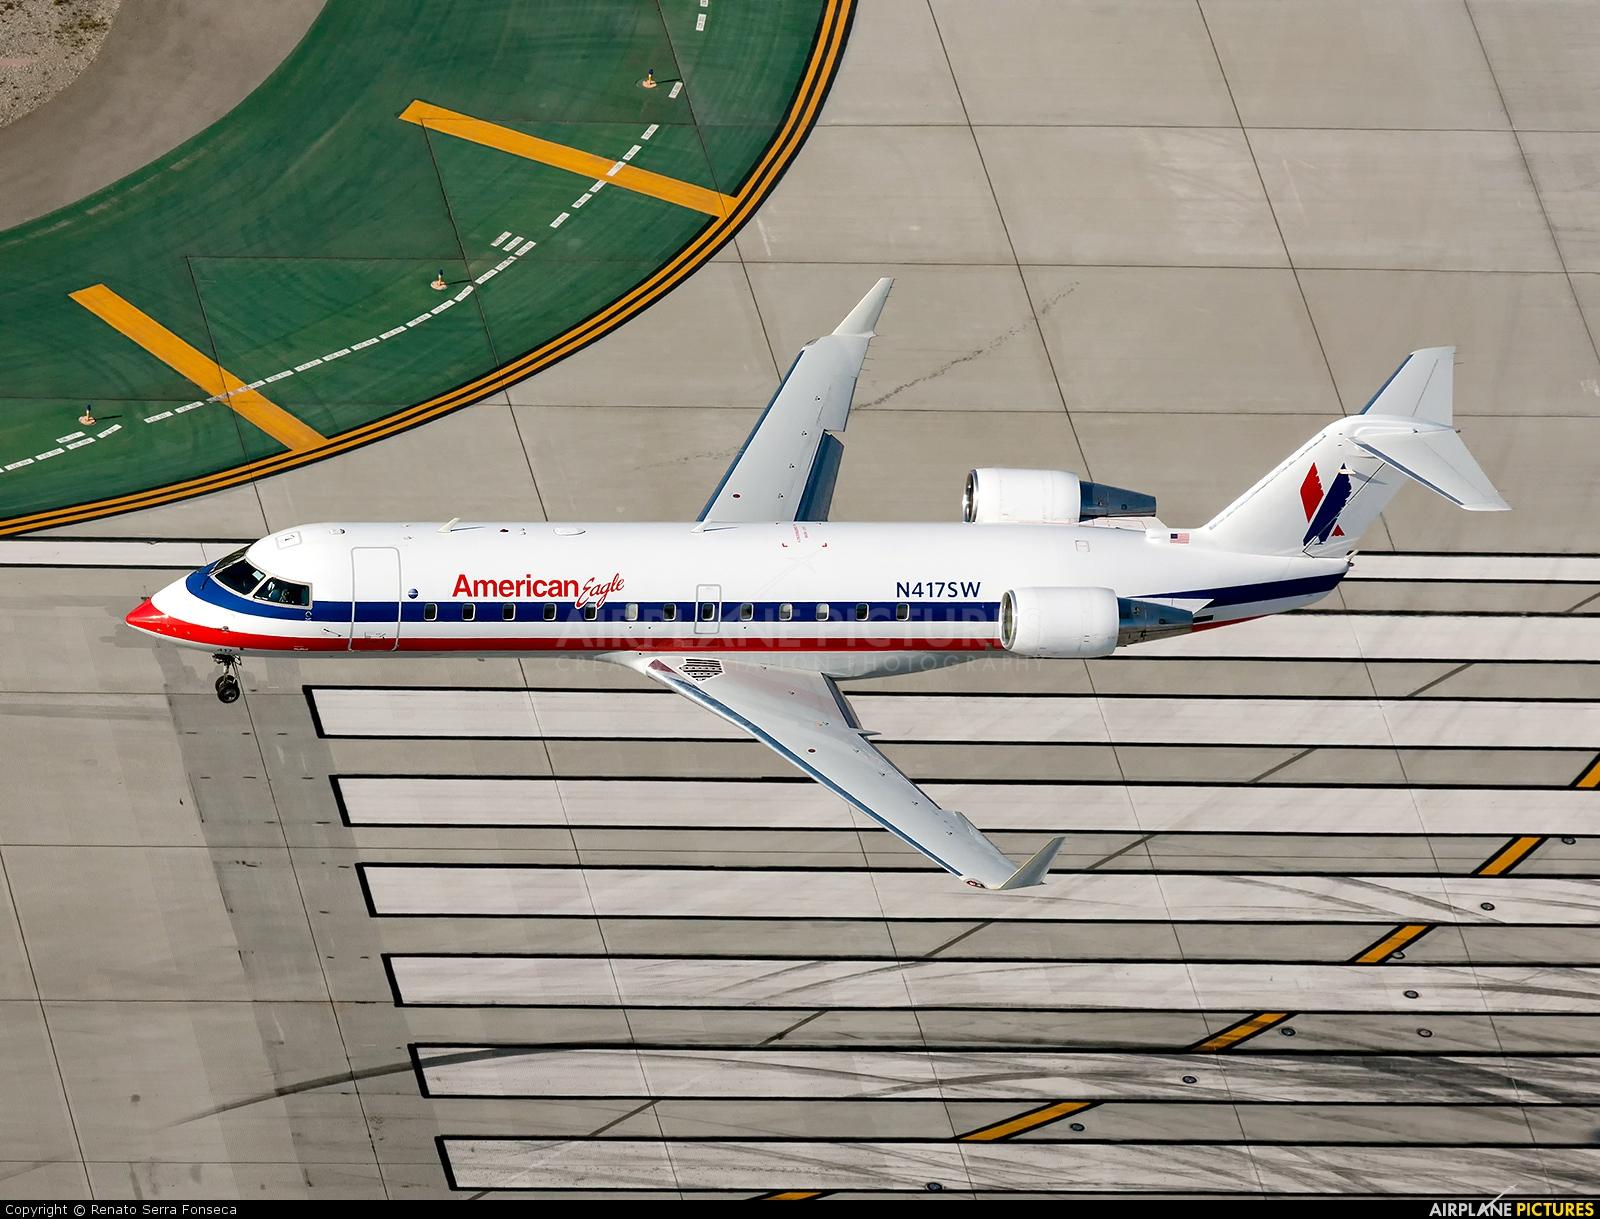 American Eagle N417SW aircraft at Los Angeles Intl